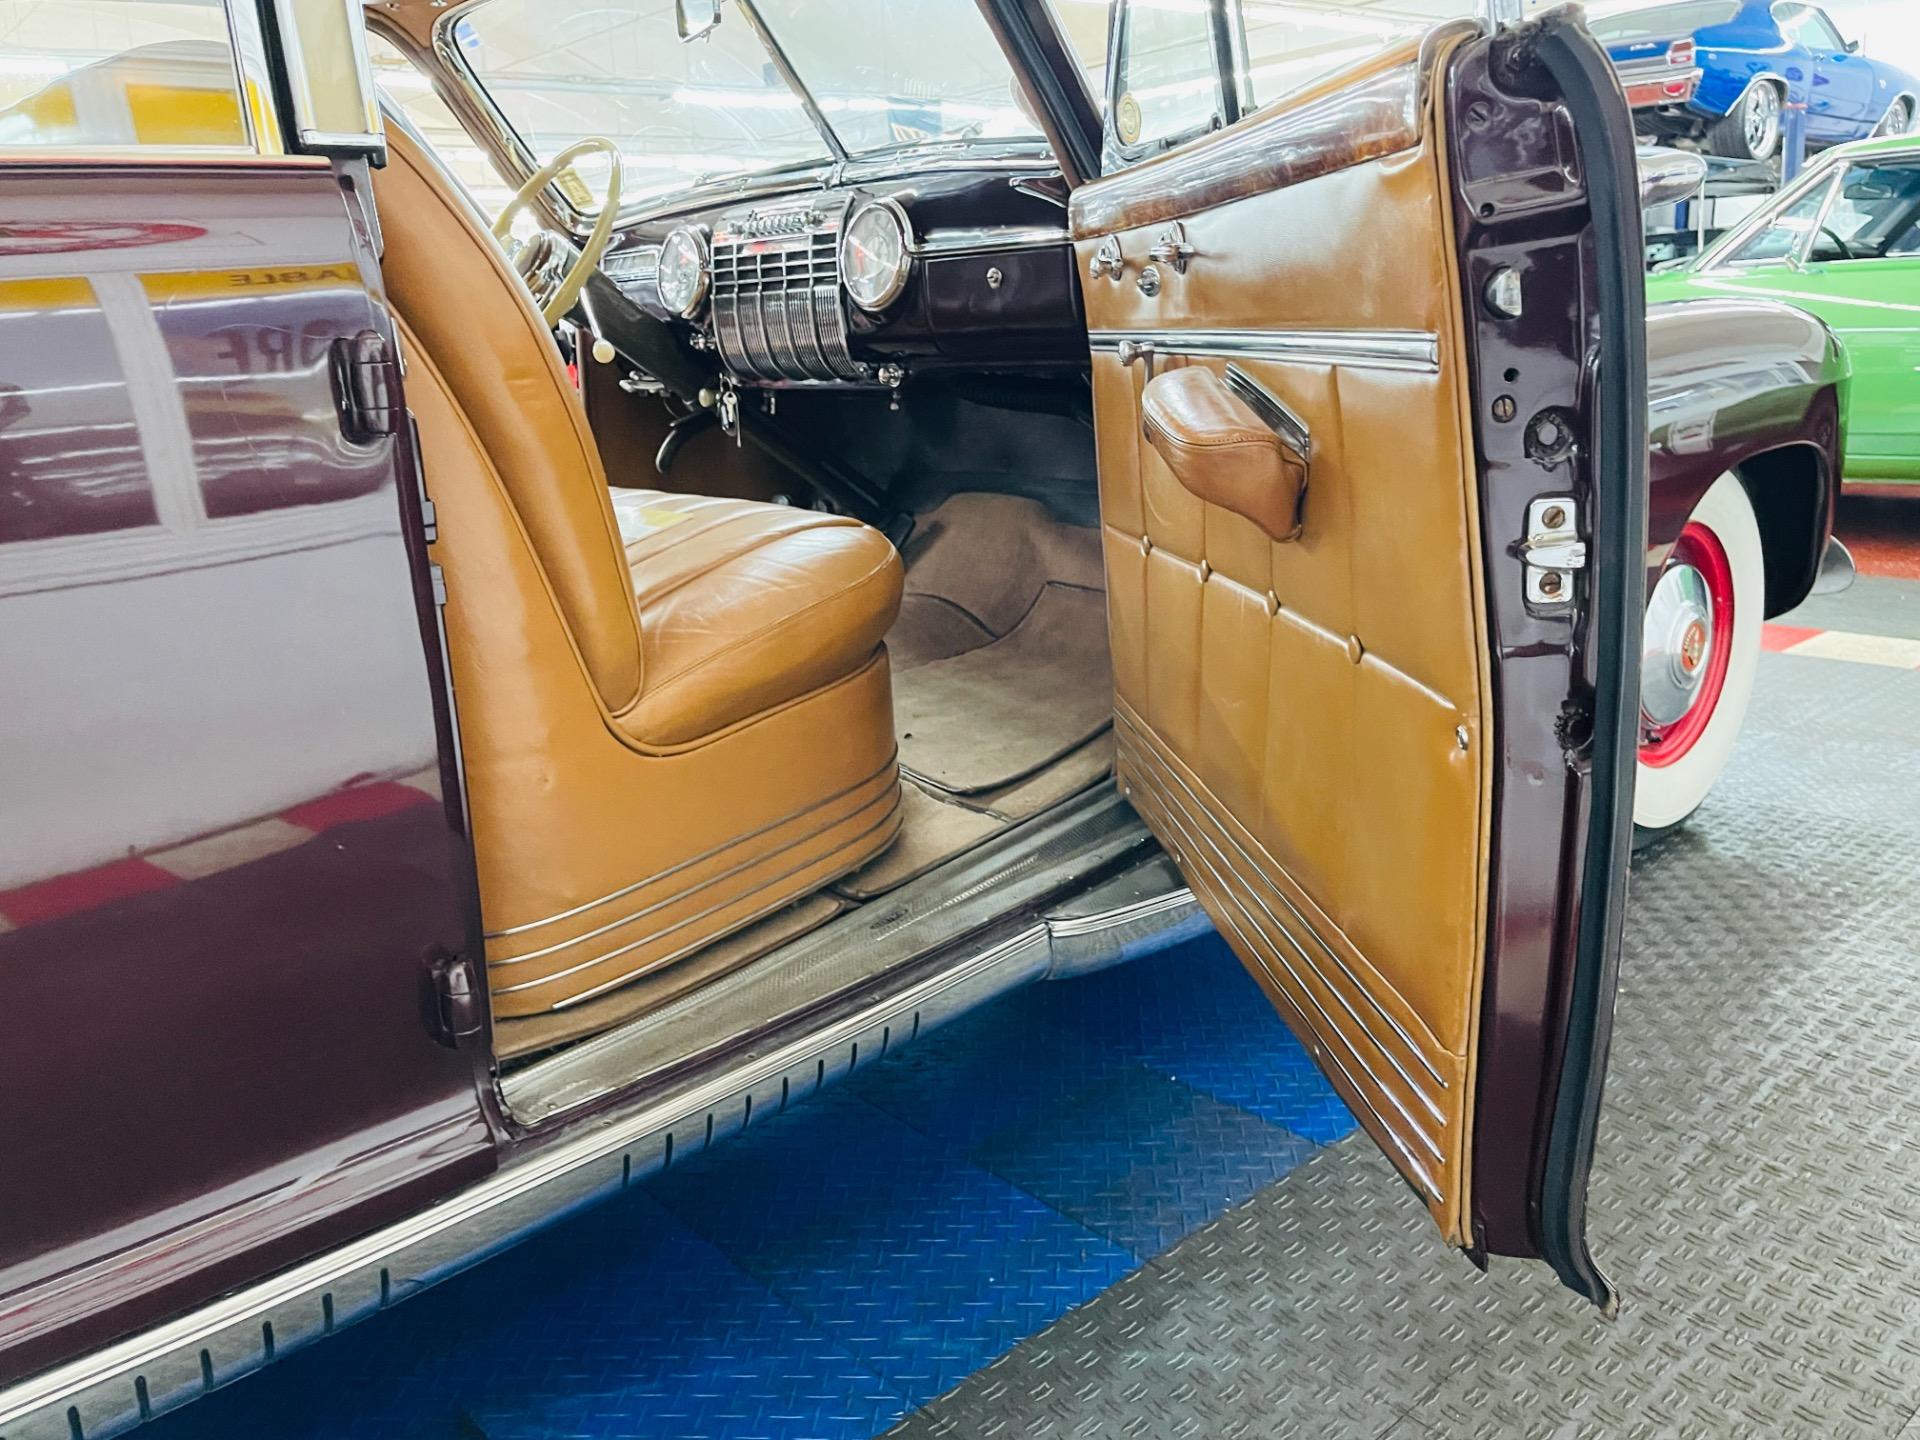 Used 1941 Cadillac Fleetwood - 4 DOOR SEDAN - HIGH QUALITY RESTORATION - SEE VIDEO   Mundelein, IL